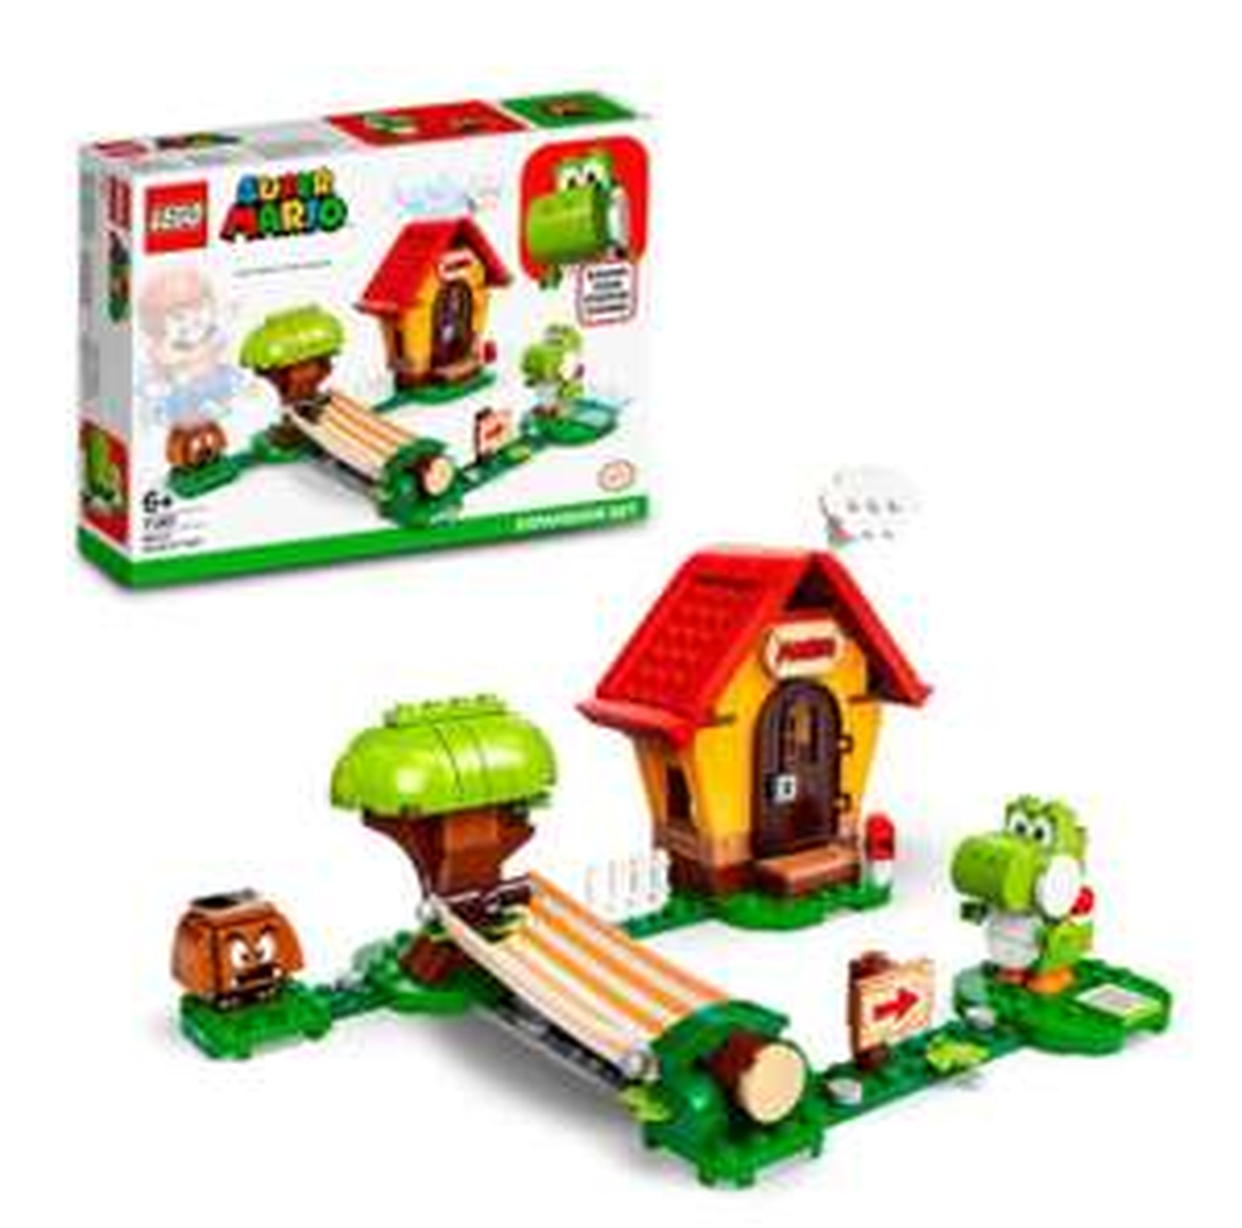 LEGO Marios House & Yoshi Expansion Set 71367/ Iron Man Armoury 76167/Venom Crawler 76163 £18.50 + delivery at Tesco